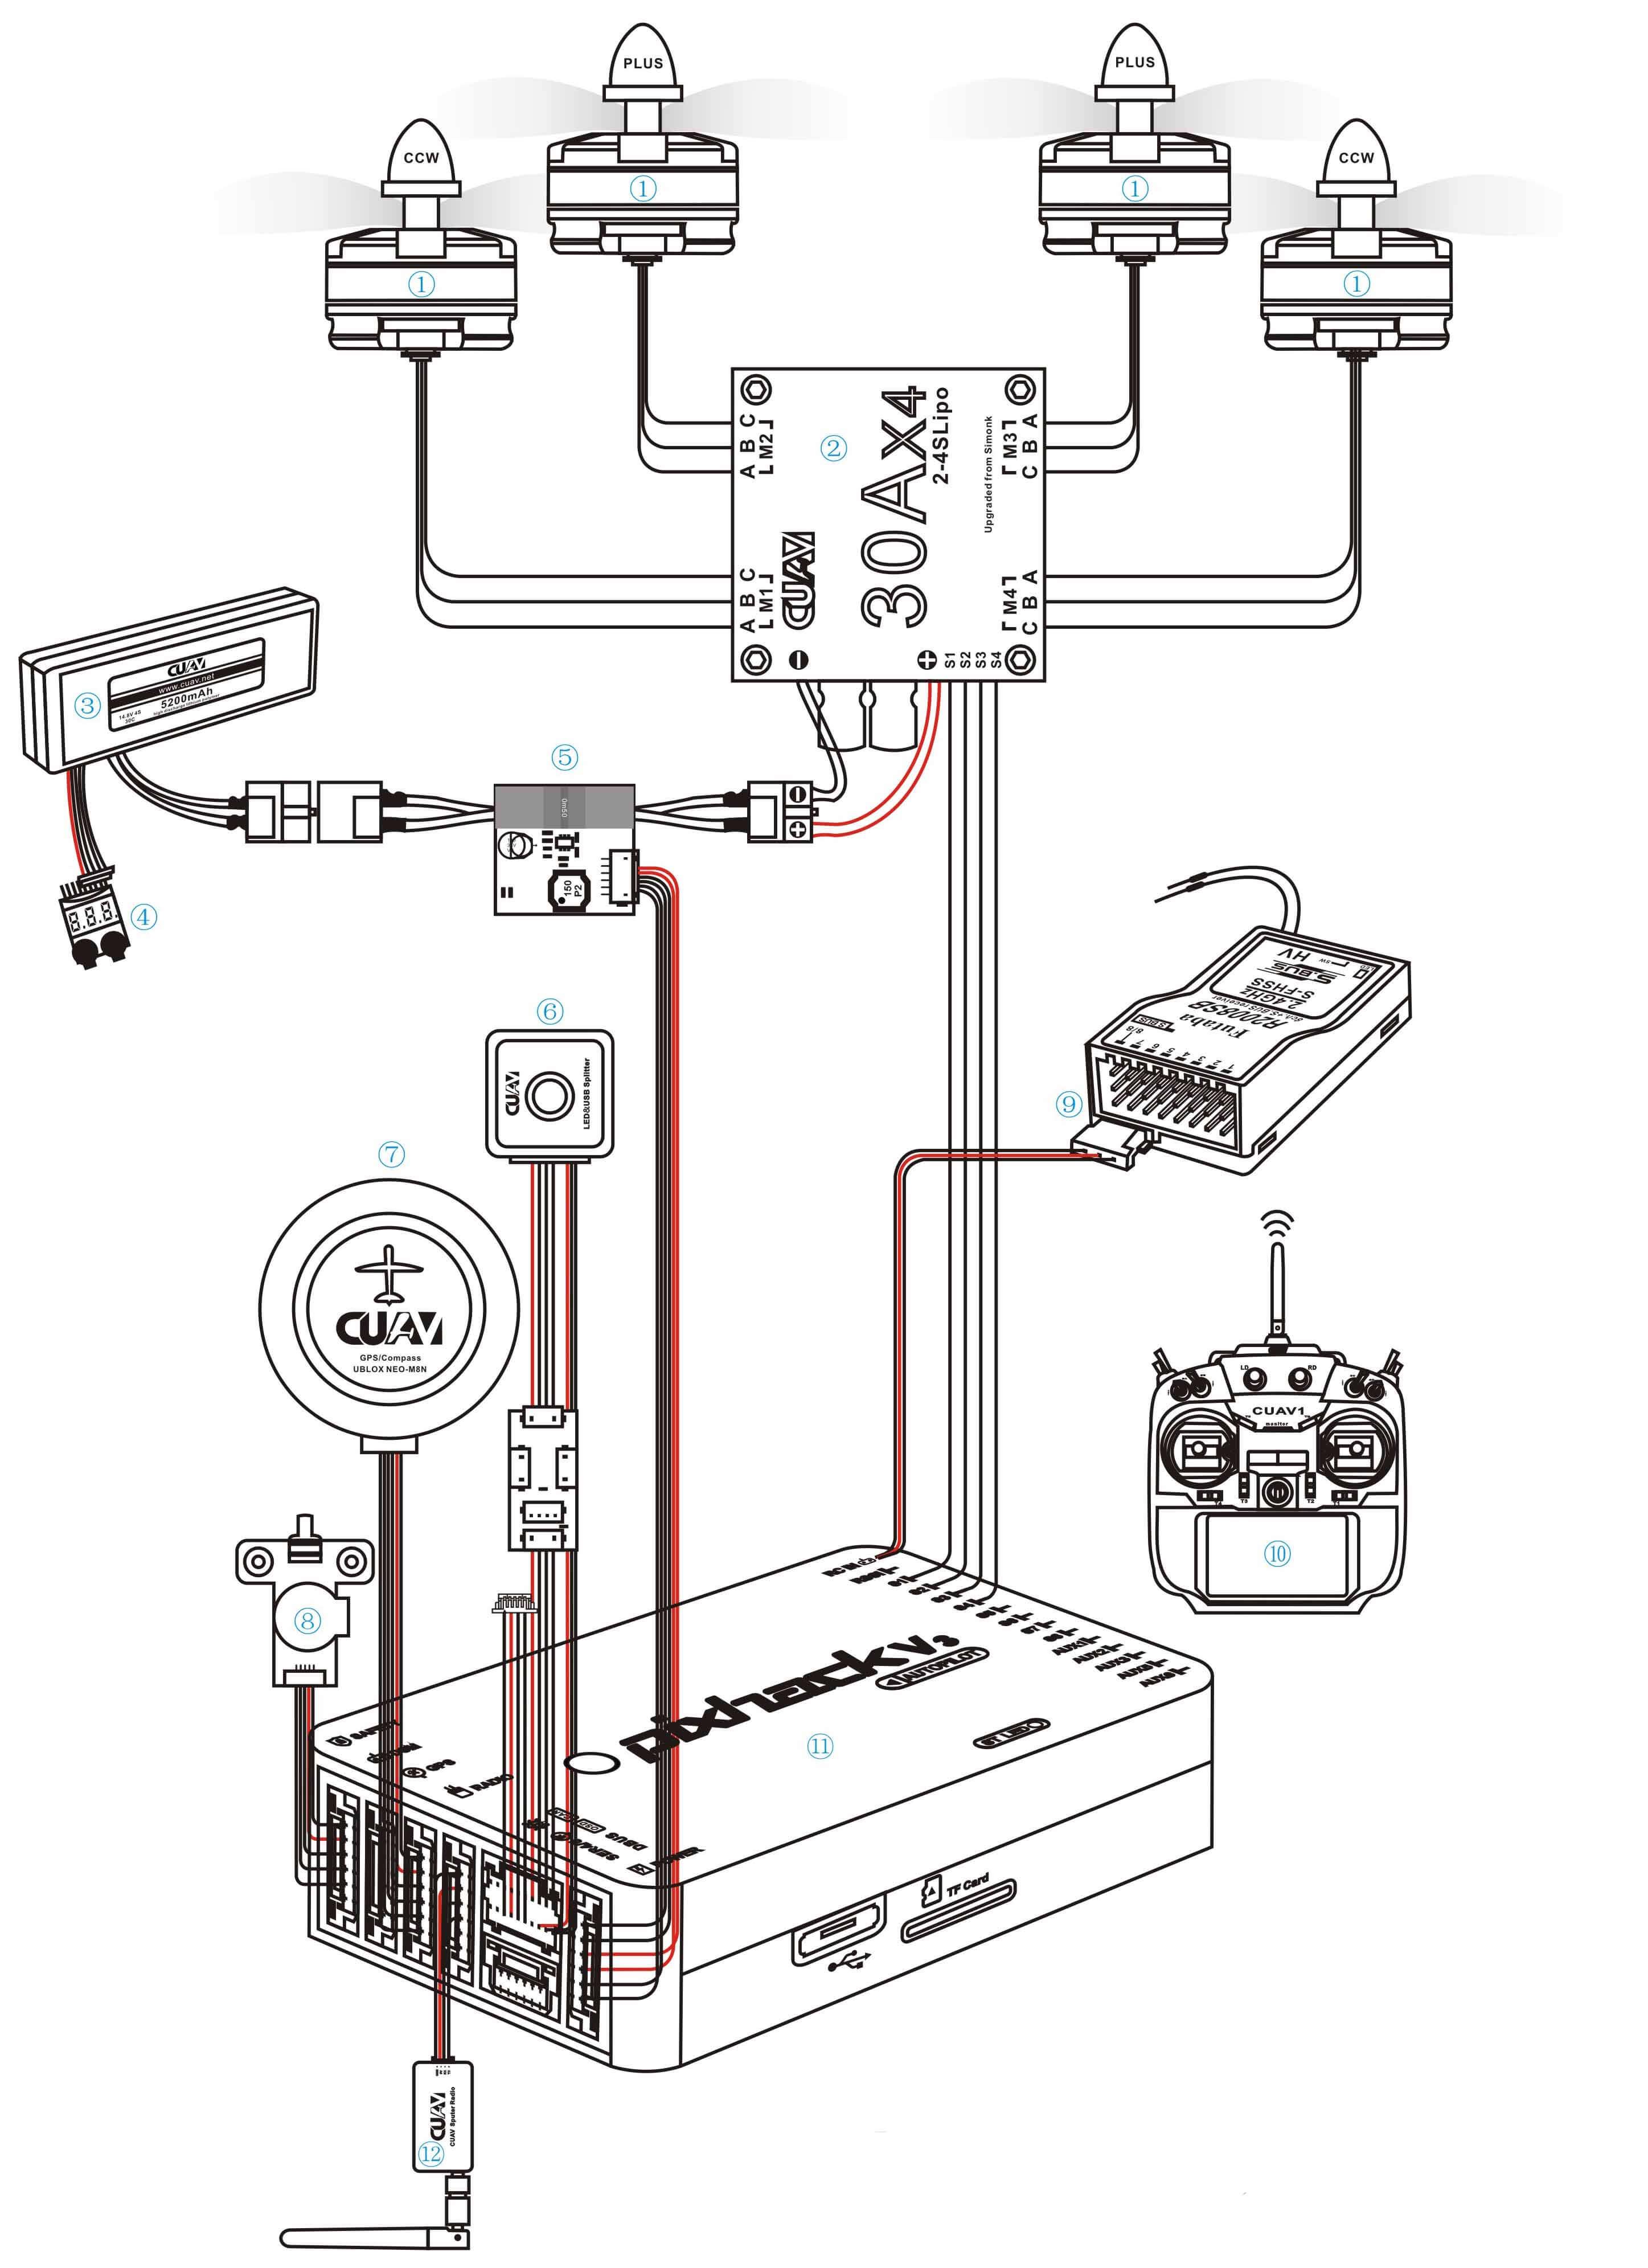 Pixhack v3x Wiring Quickstart · pixhack